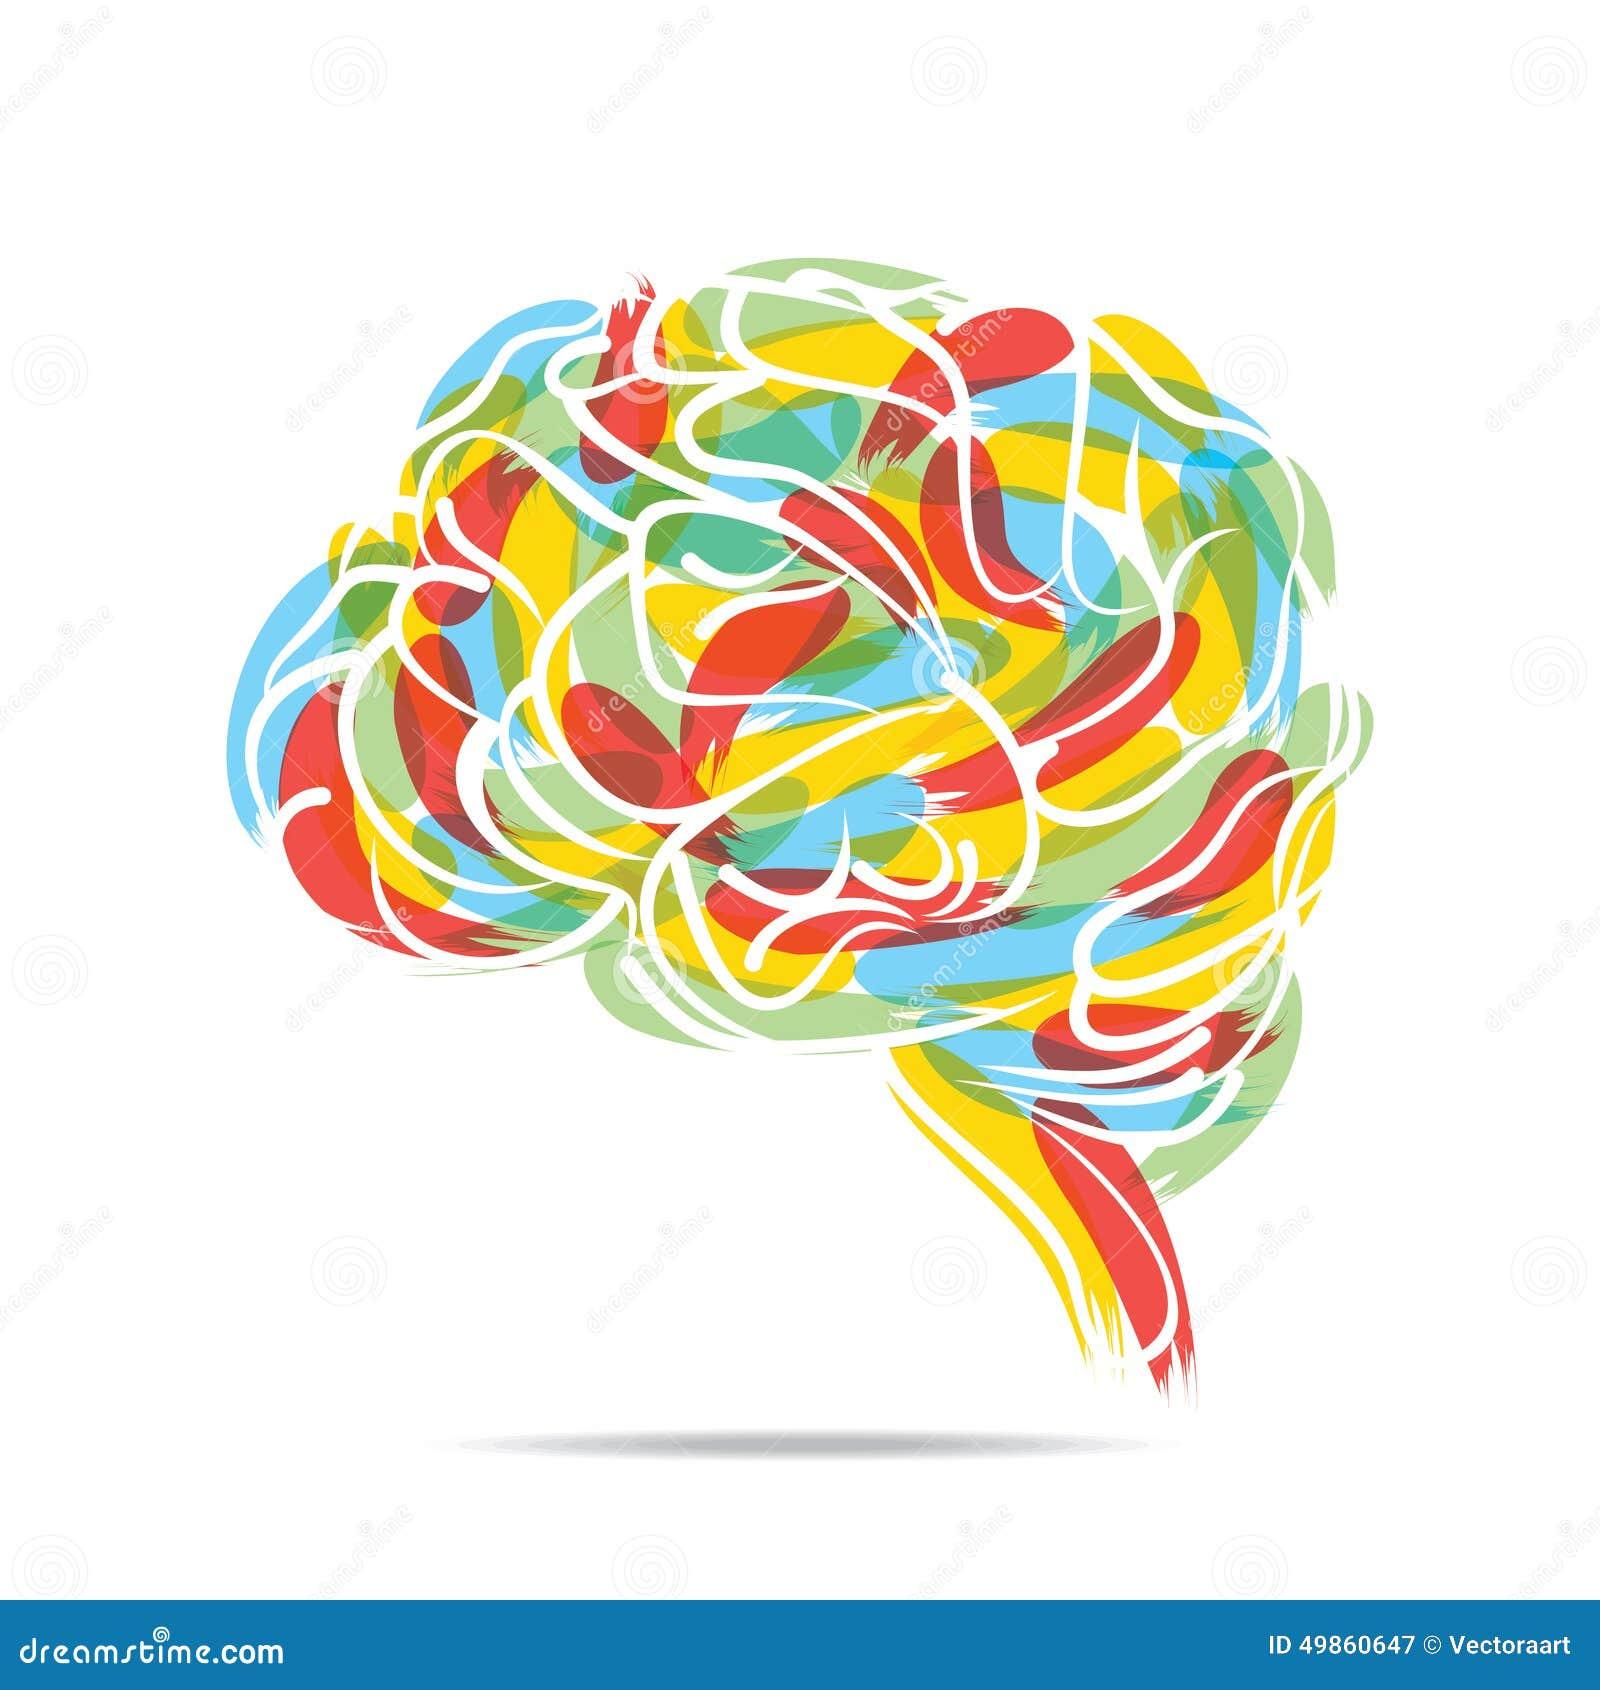 abstract brain wallpaper mind - photo #29